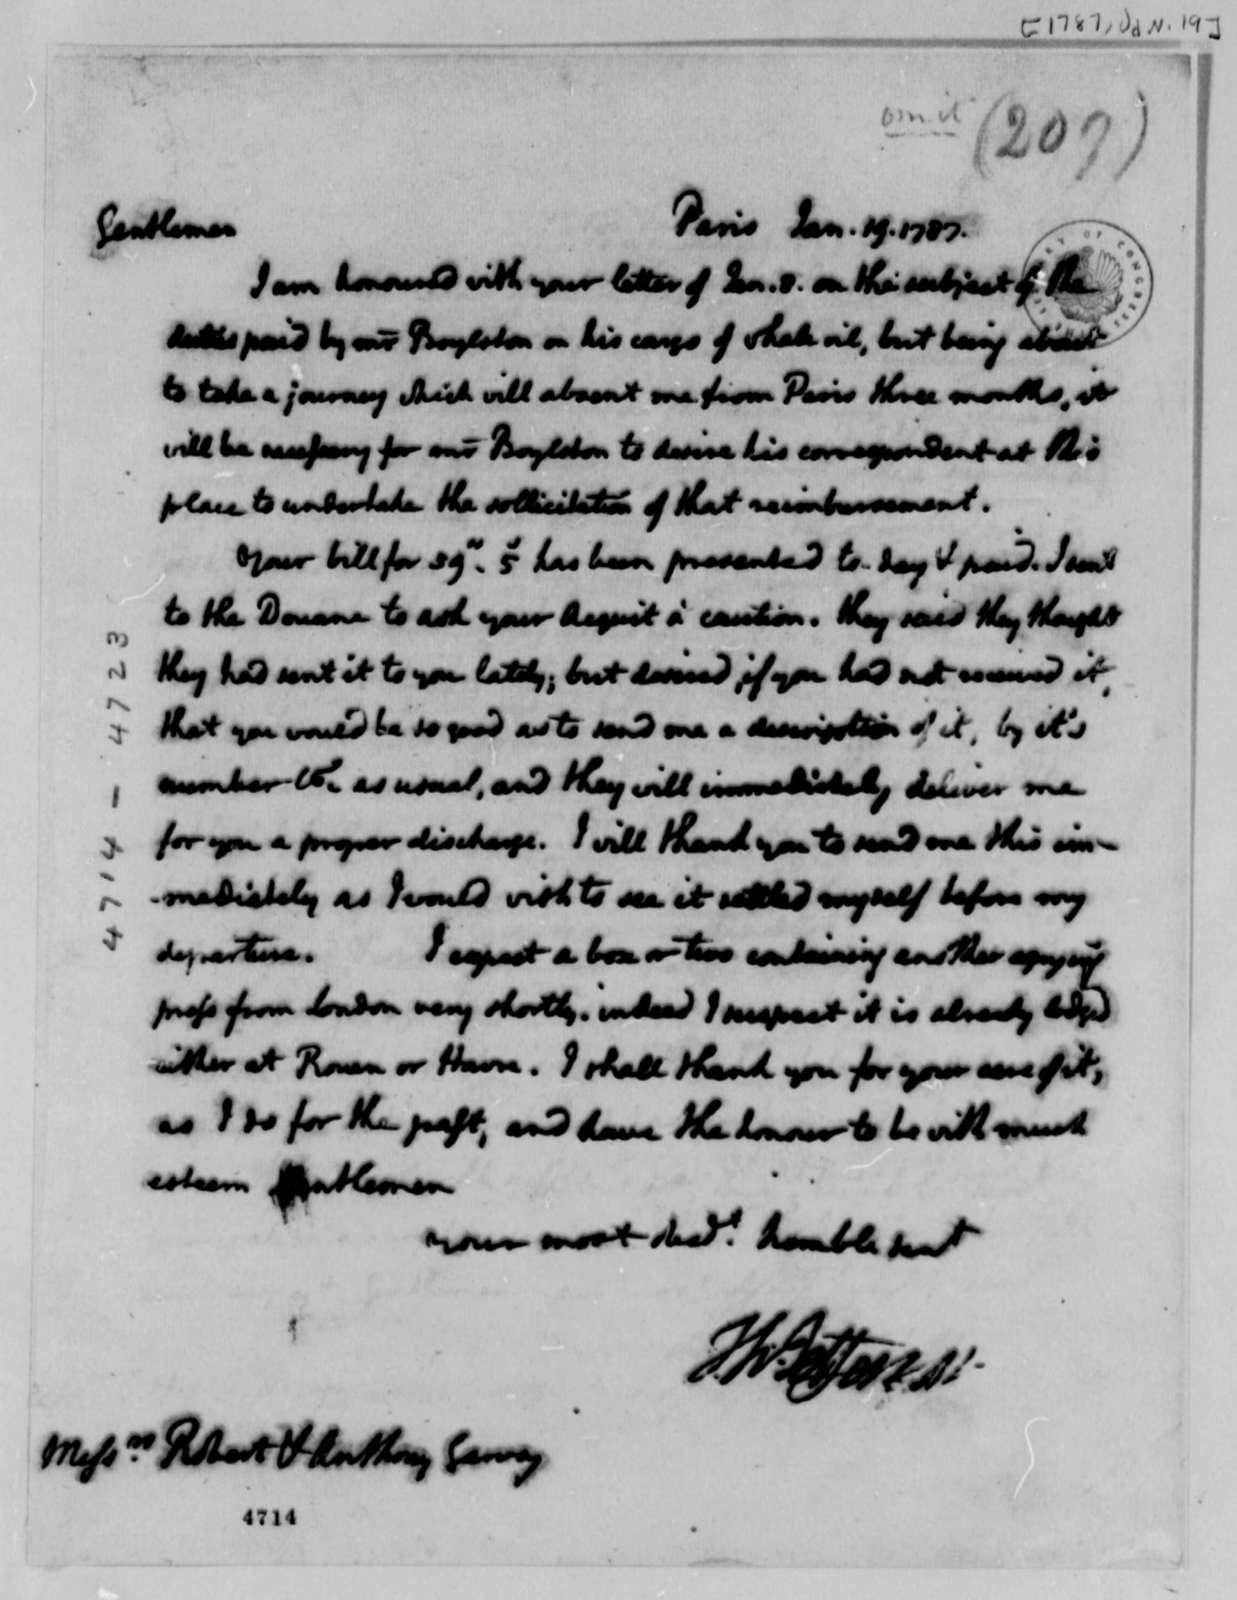 Thomas Jefferson to Robert and Anthony Garvey, January 19, 1787